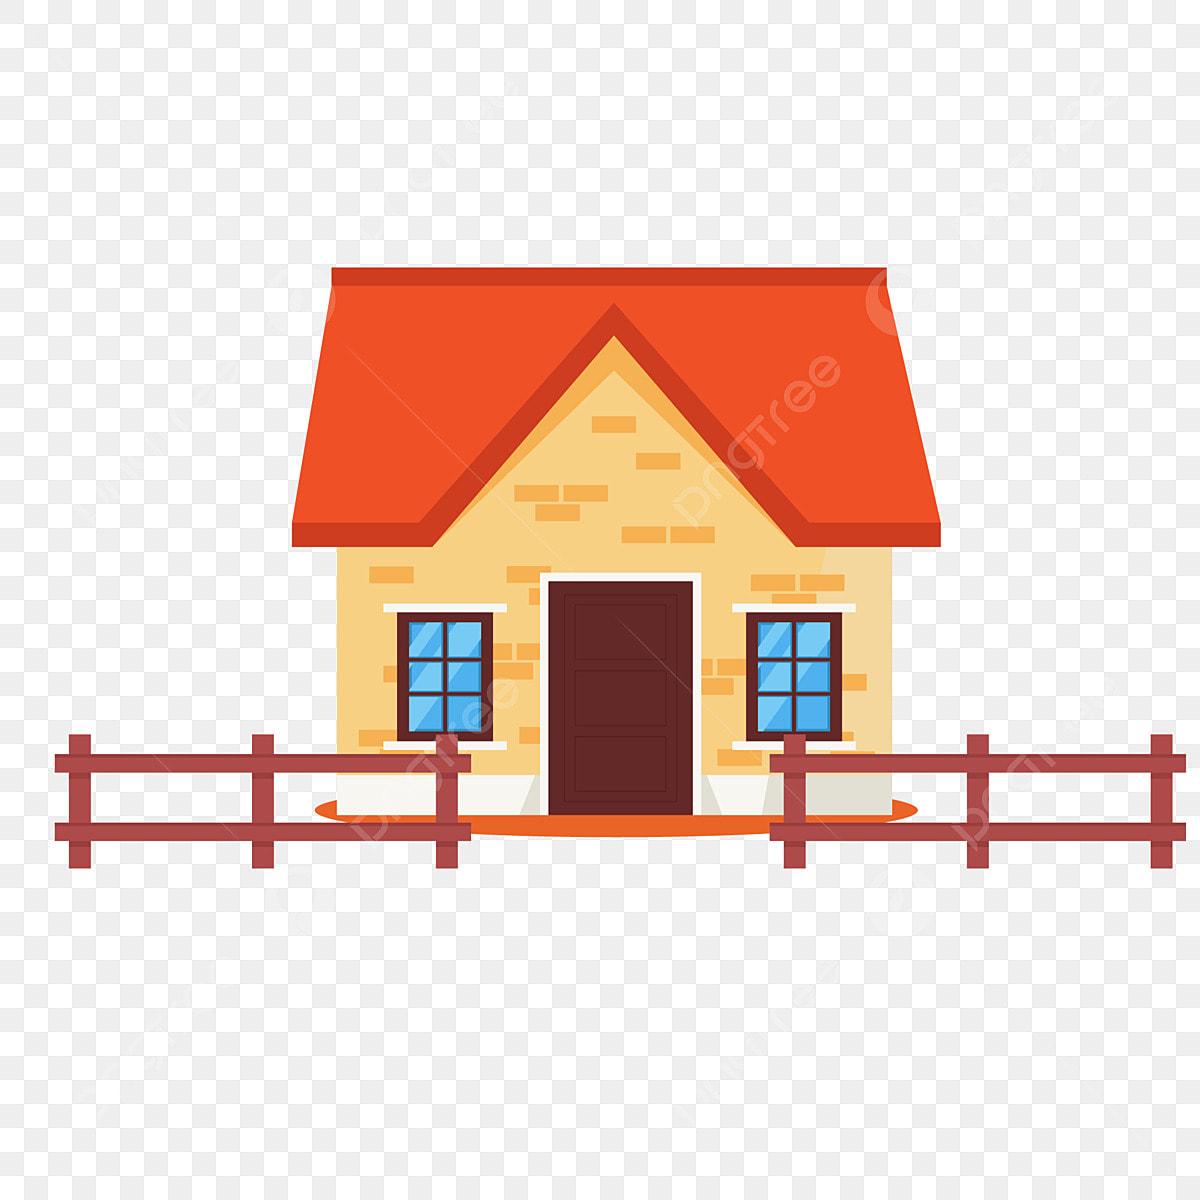 Cartoon Colorful Rural House Design Element Cartoon Color